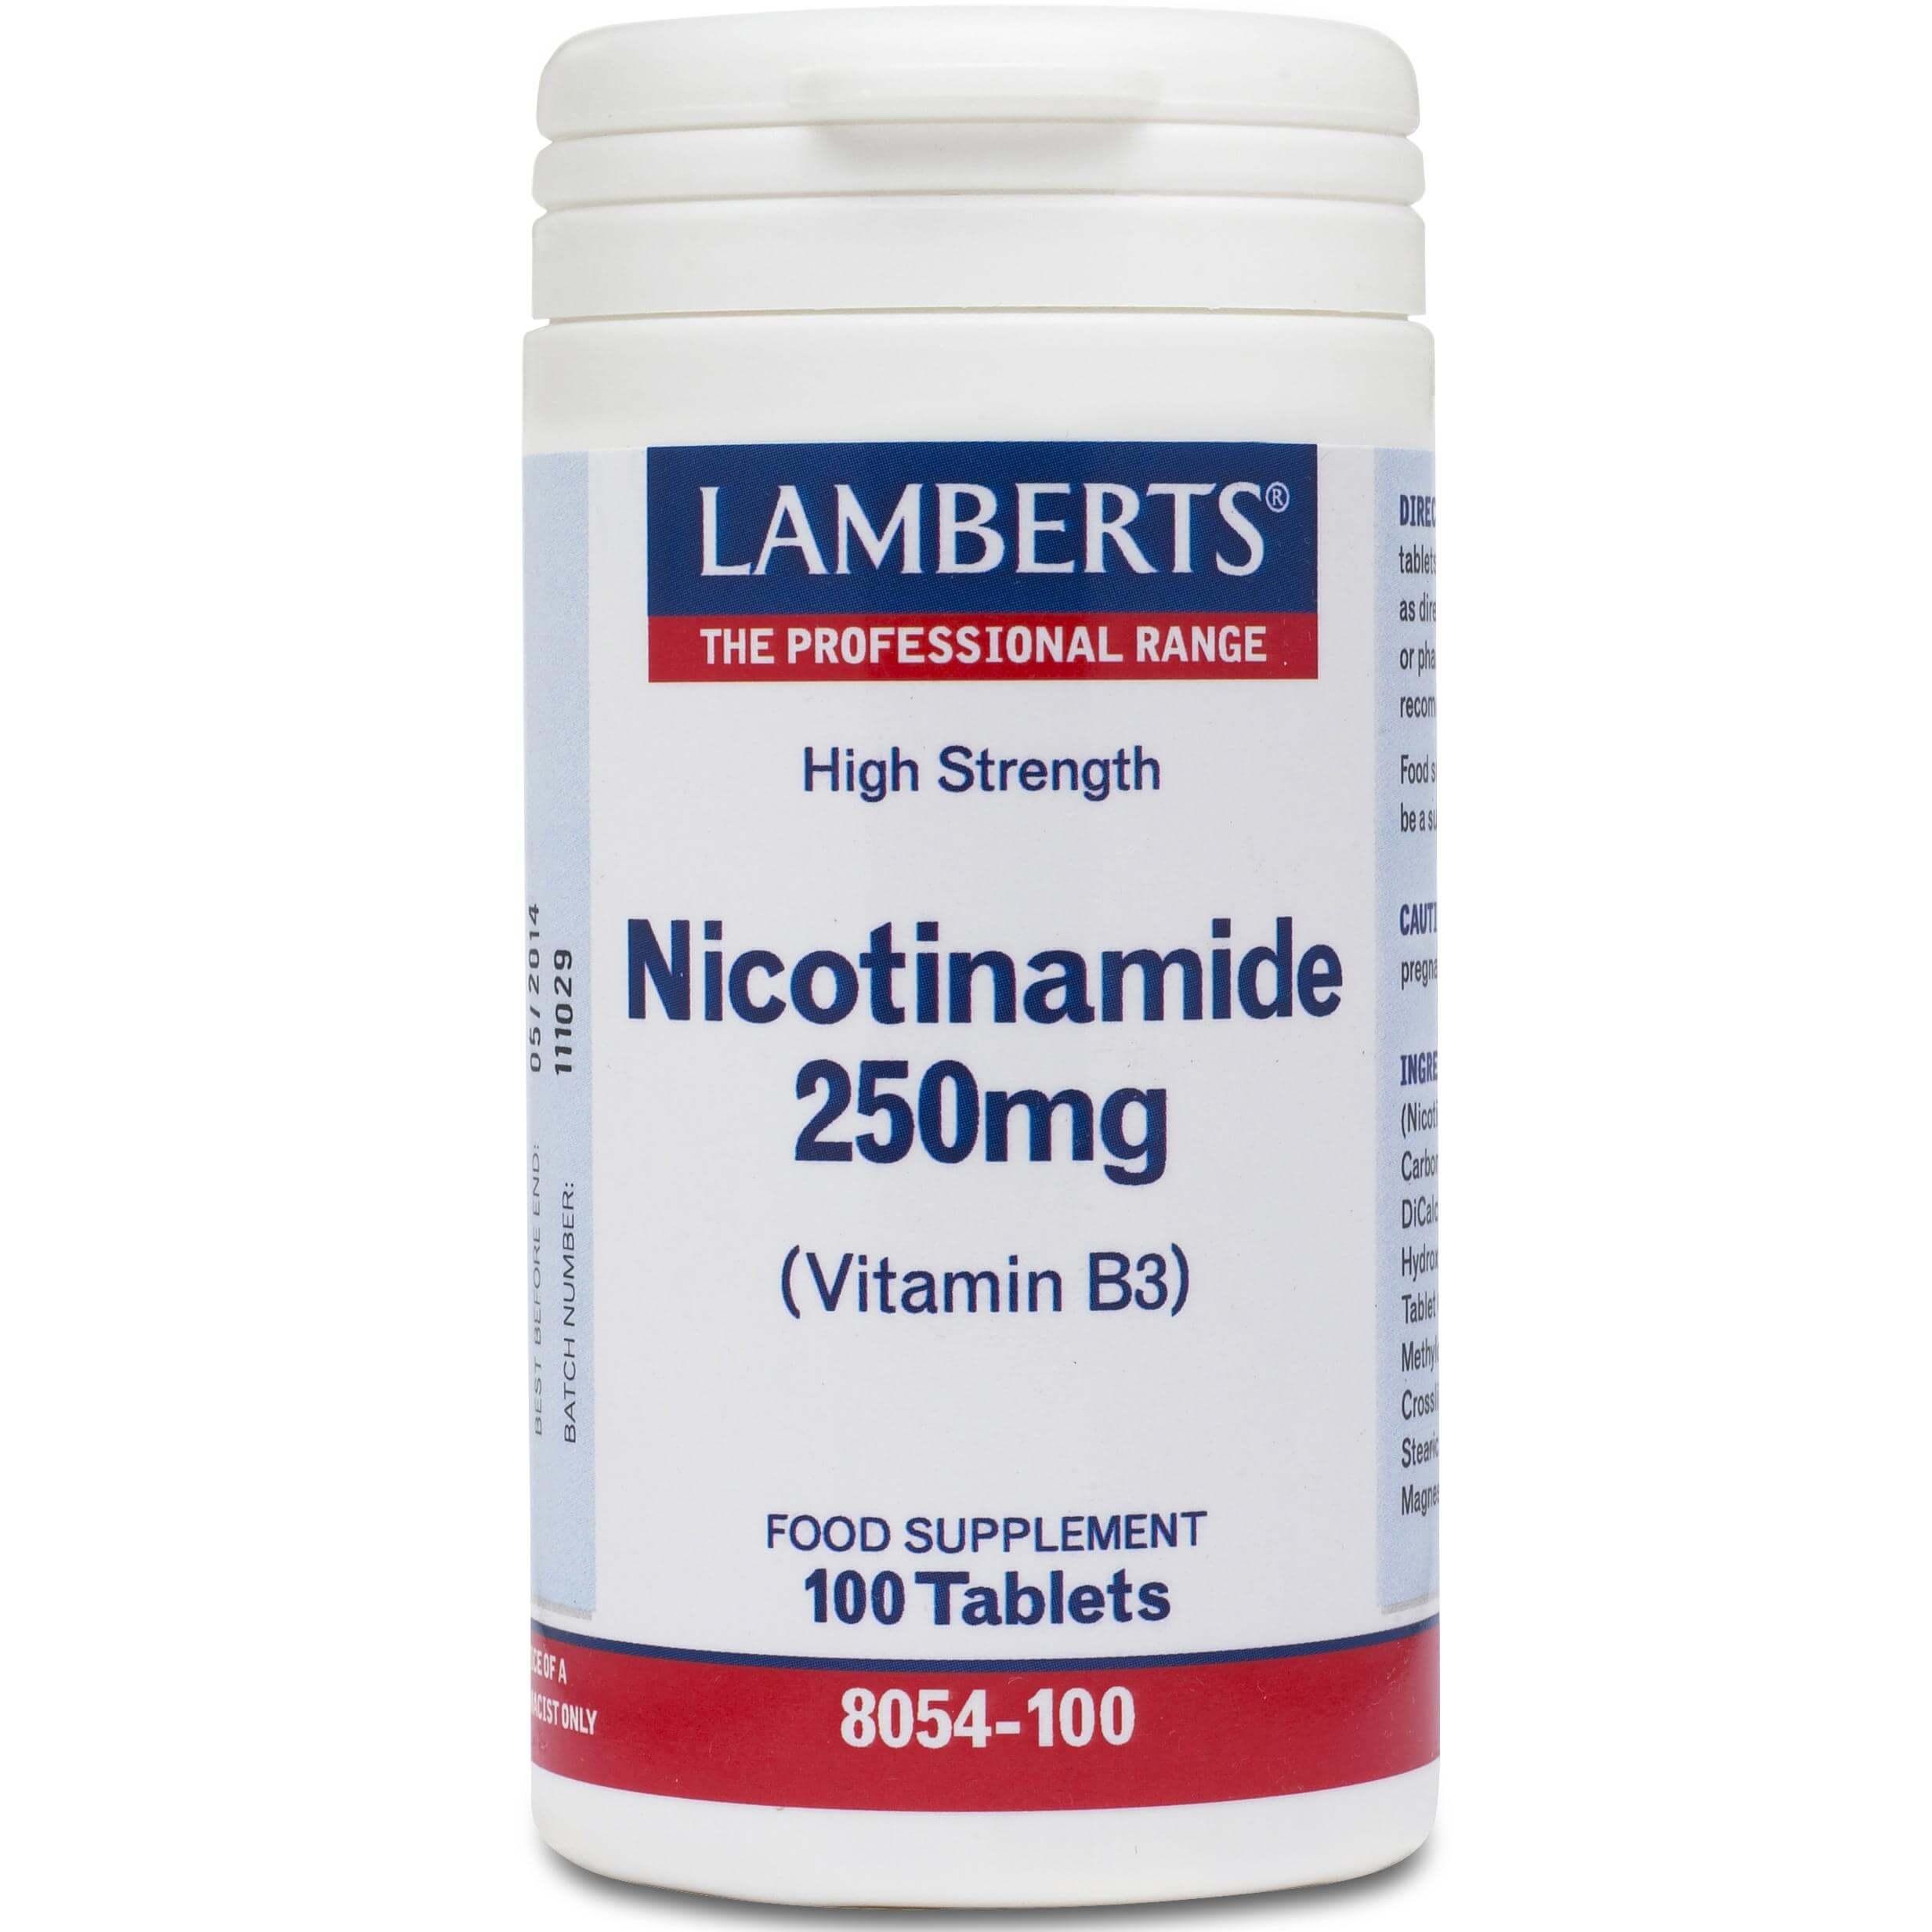 Lamberts NicotinamideΣυμπλήρωμα Διατροφής για τη Μνήμη και τη Πνευματική Απόδοση250mg100tabs